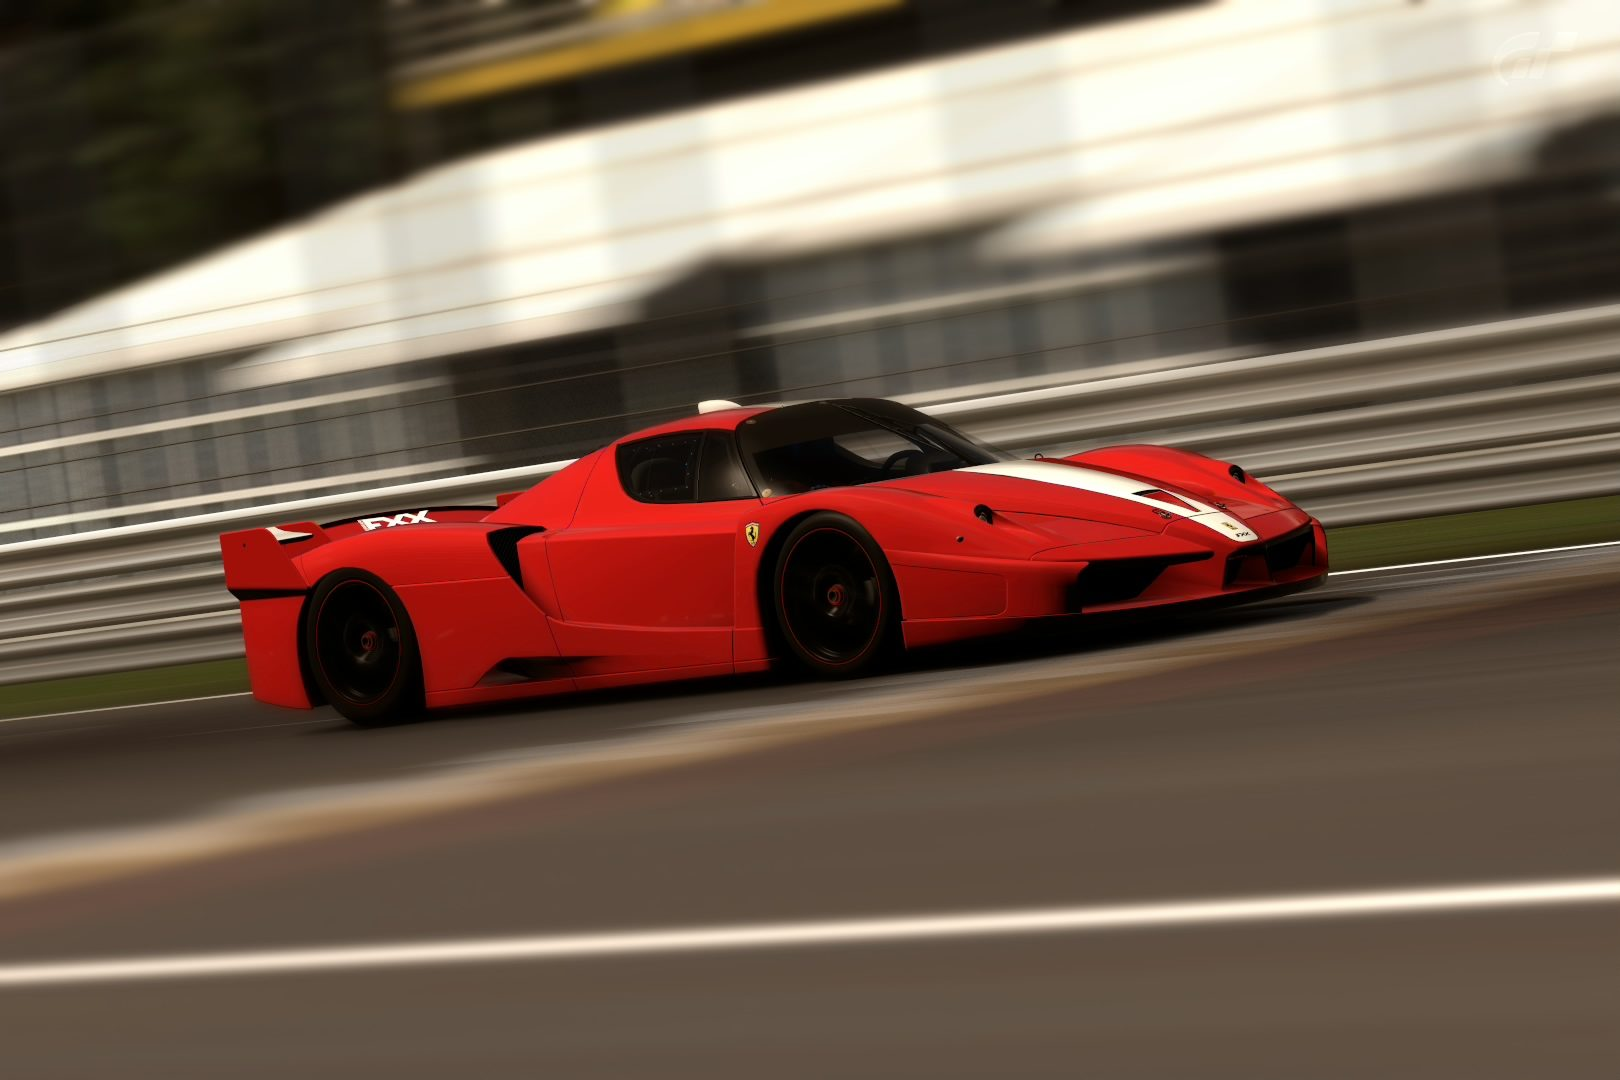 Ferrari FXX '07 (Car).jpg